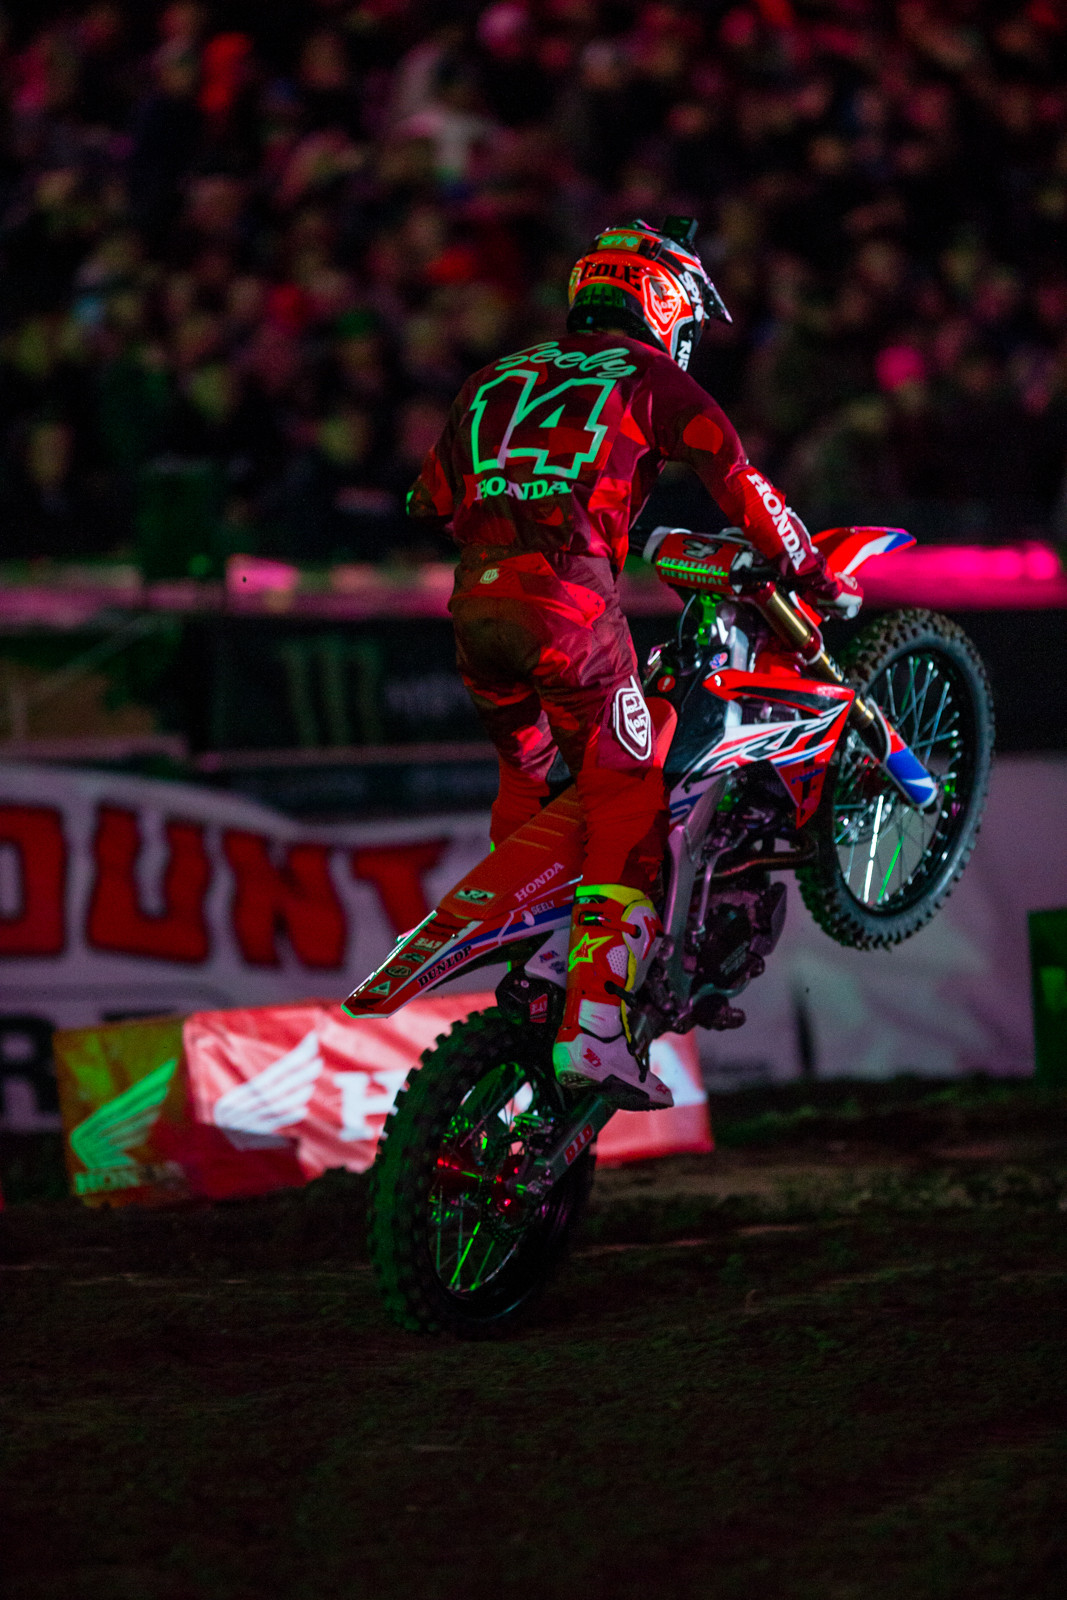 OpeningCeremoniesA1 (4 of 4) - Vital MX Pit Bits: Anaheim 1 - Motocross Pictures - Vital MX